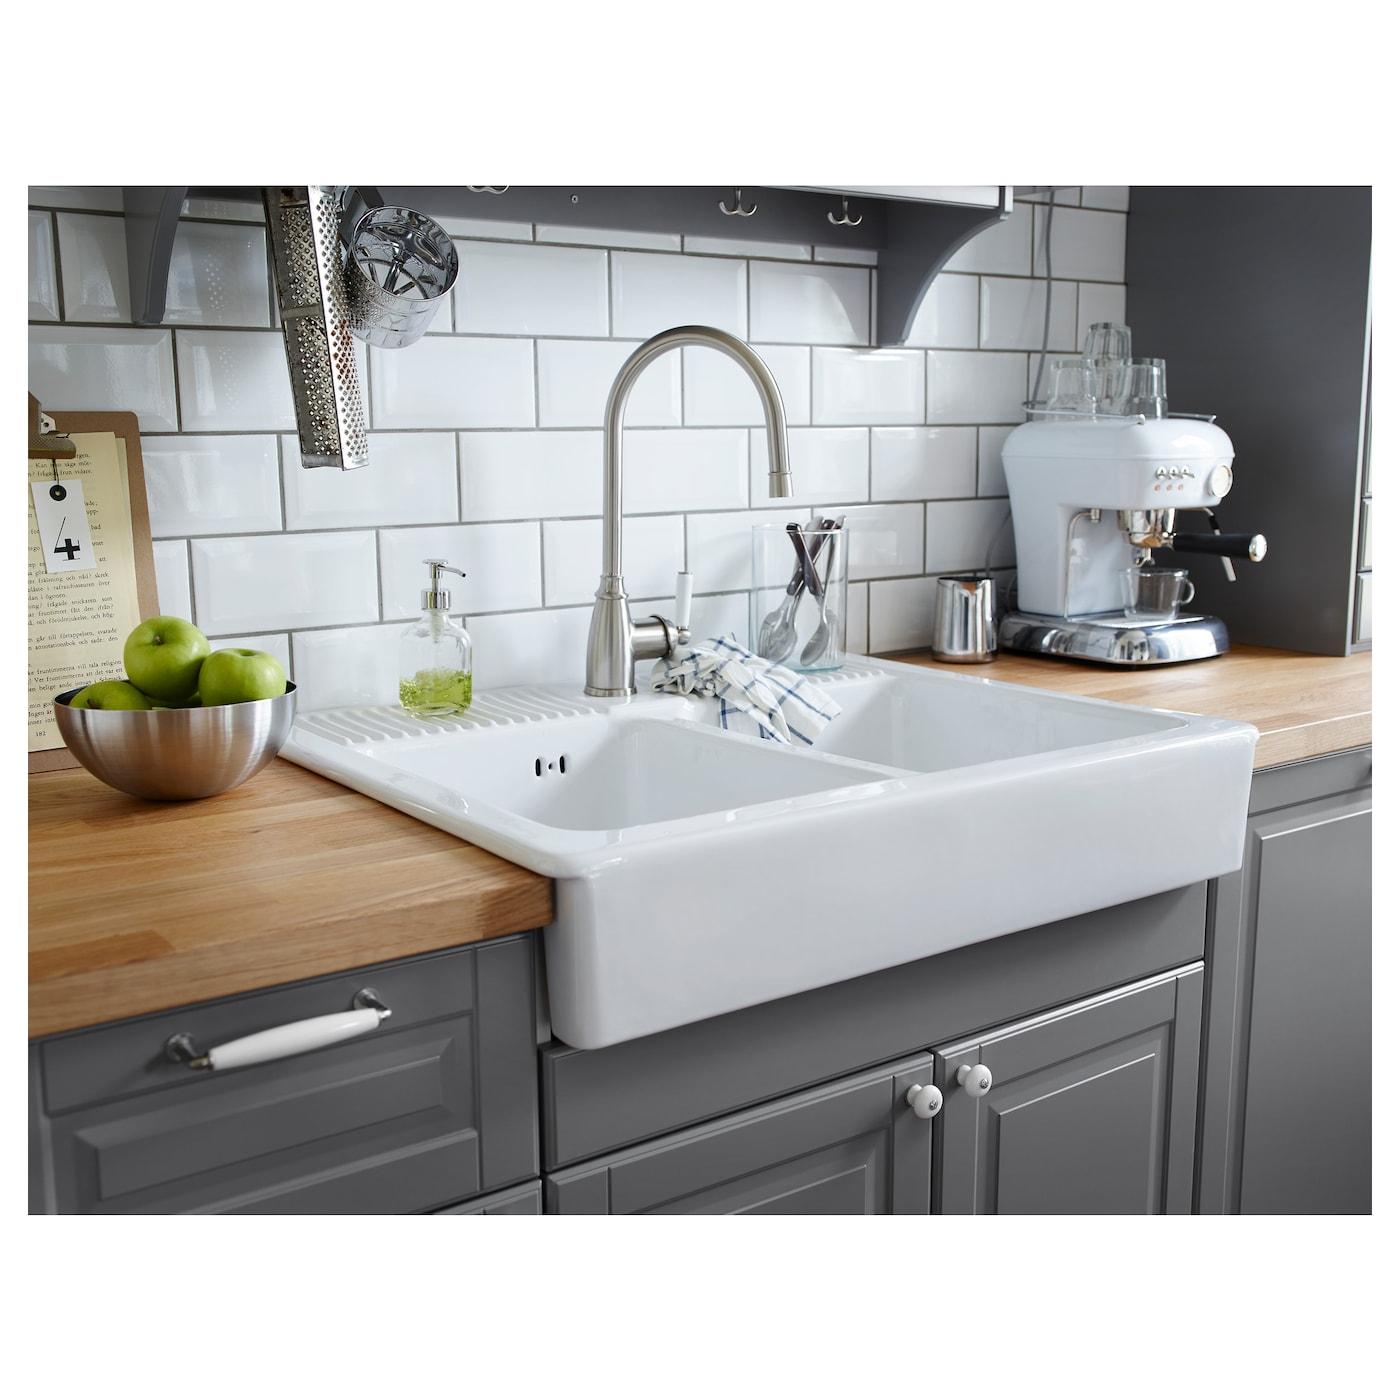 elverdam mitigeur couleur acier inox ikea. Black Bedroom Furniture Sets. Home Design Ideas